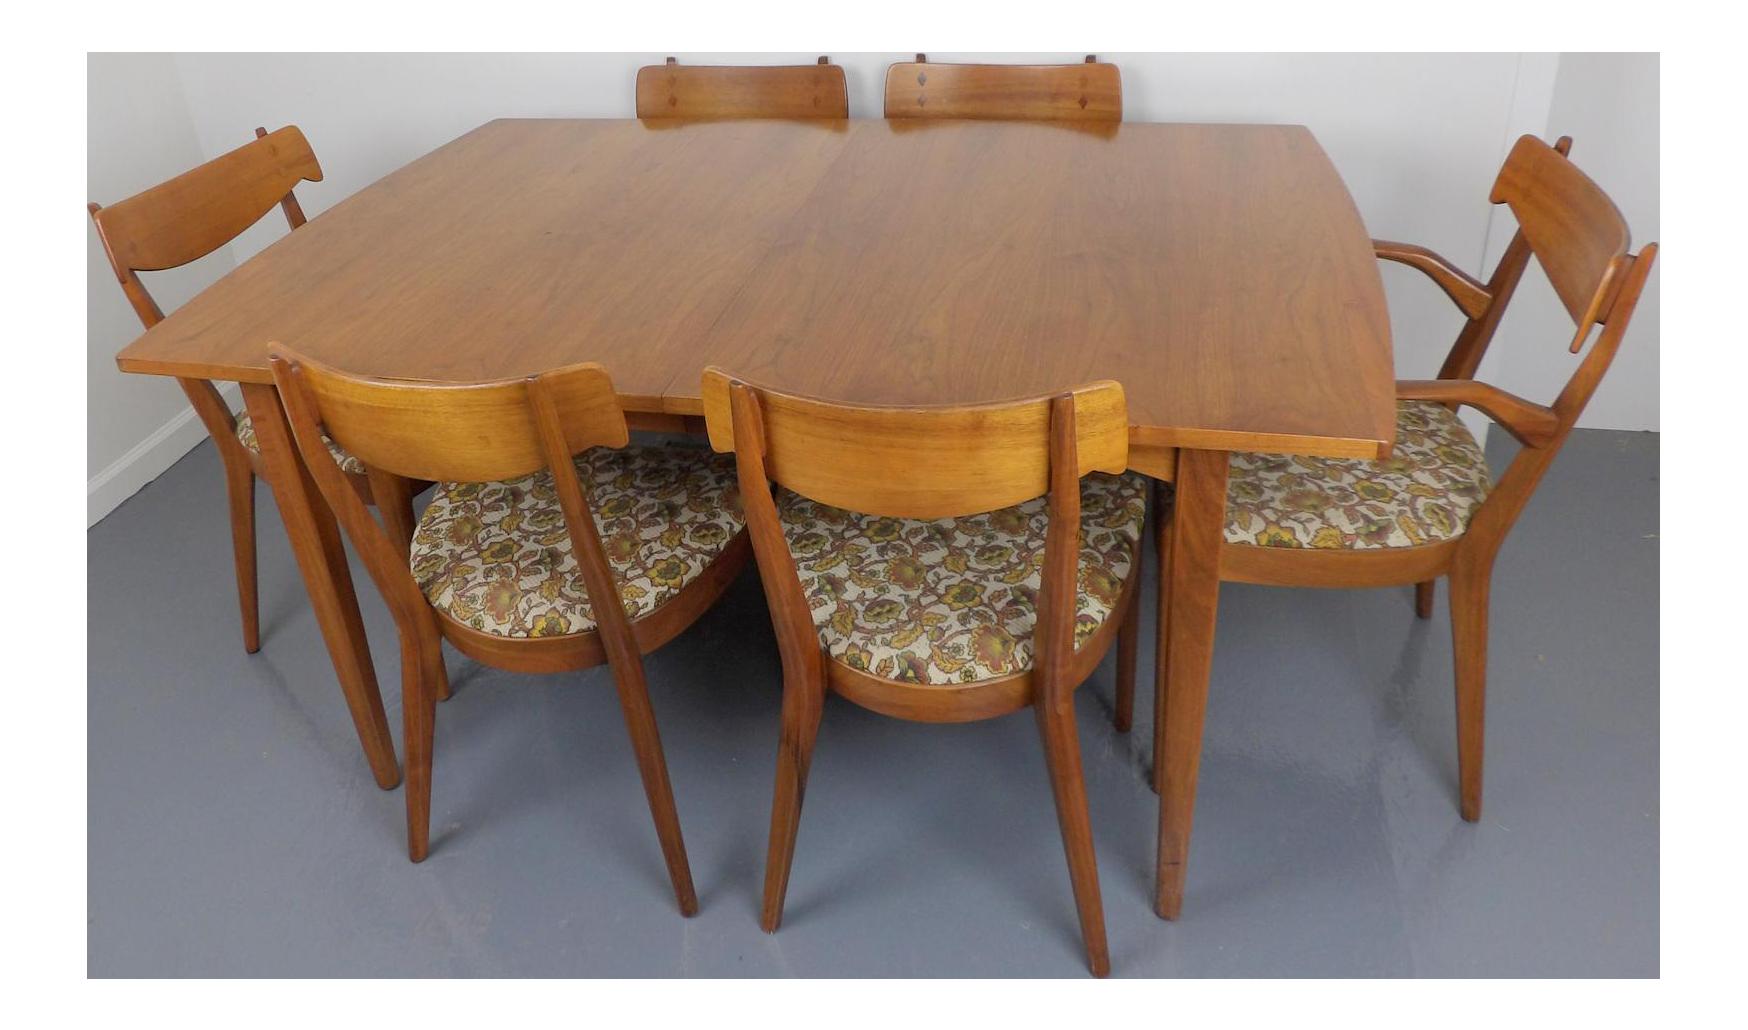 Mid Century Modern Walnut Dining Table Leaves u0026 6 Chairs Set Kipp Stewart for Drexel Declaration  sc 1 st  Chairish & Mid Century Modern Walnut Dining Table Leaves u0026 6 Chairs Set Kipp ...